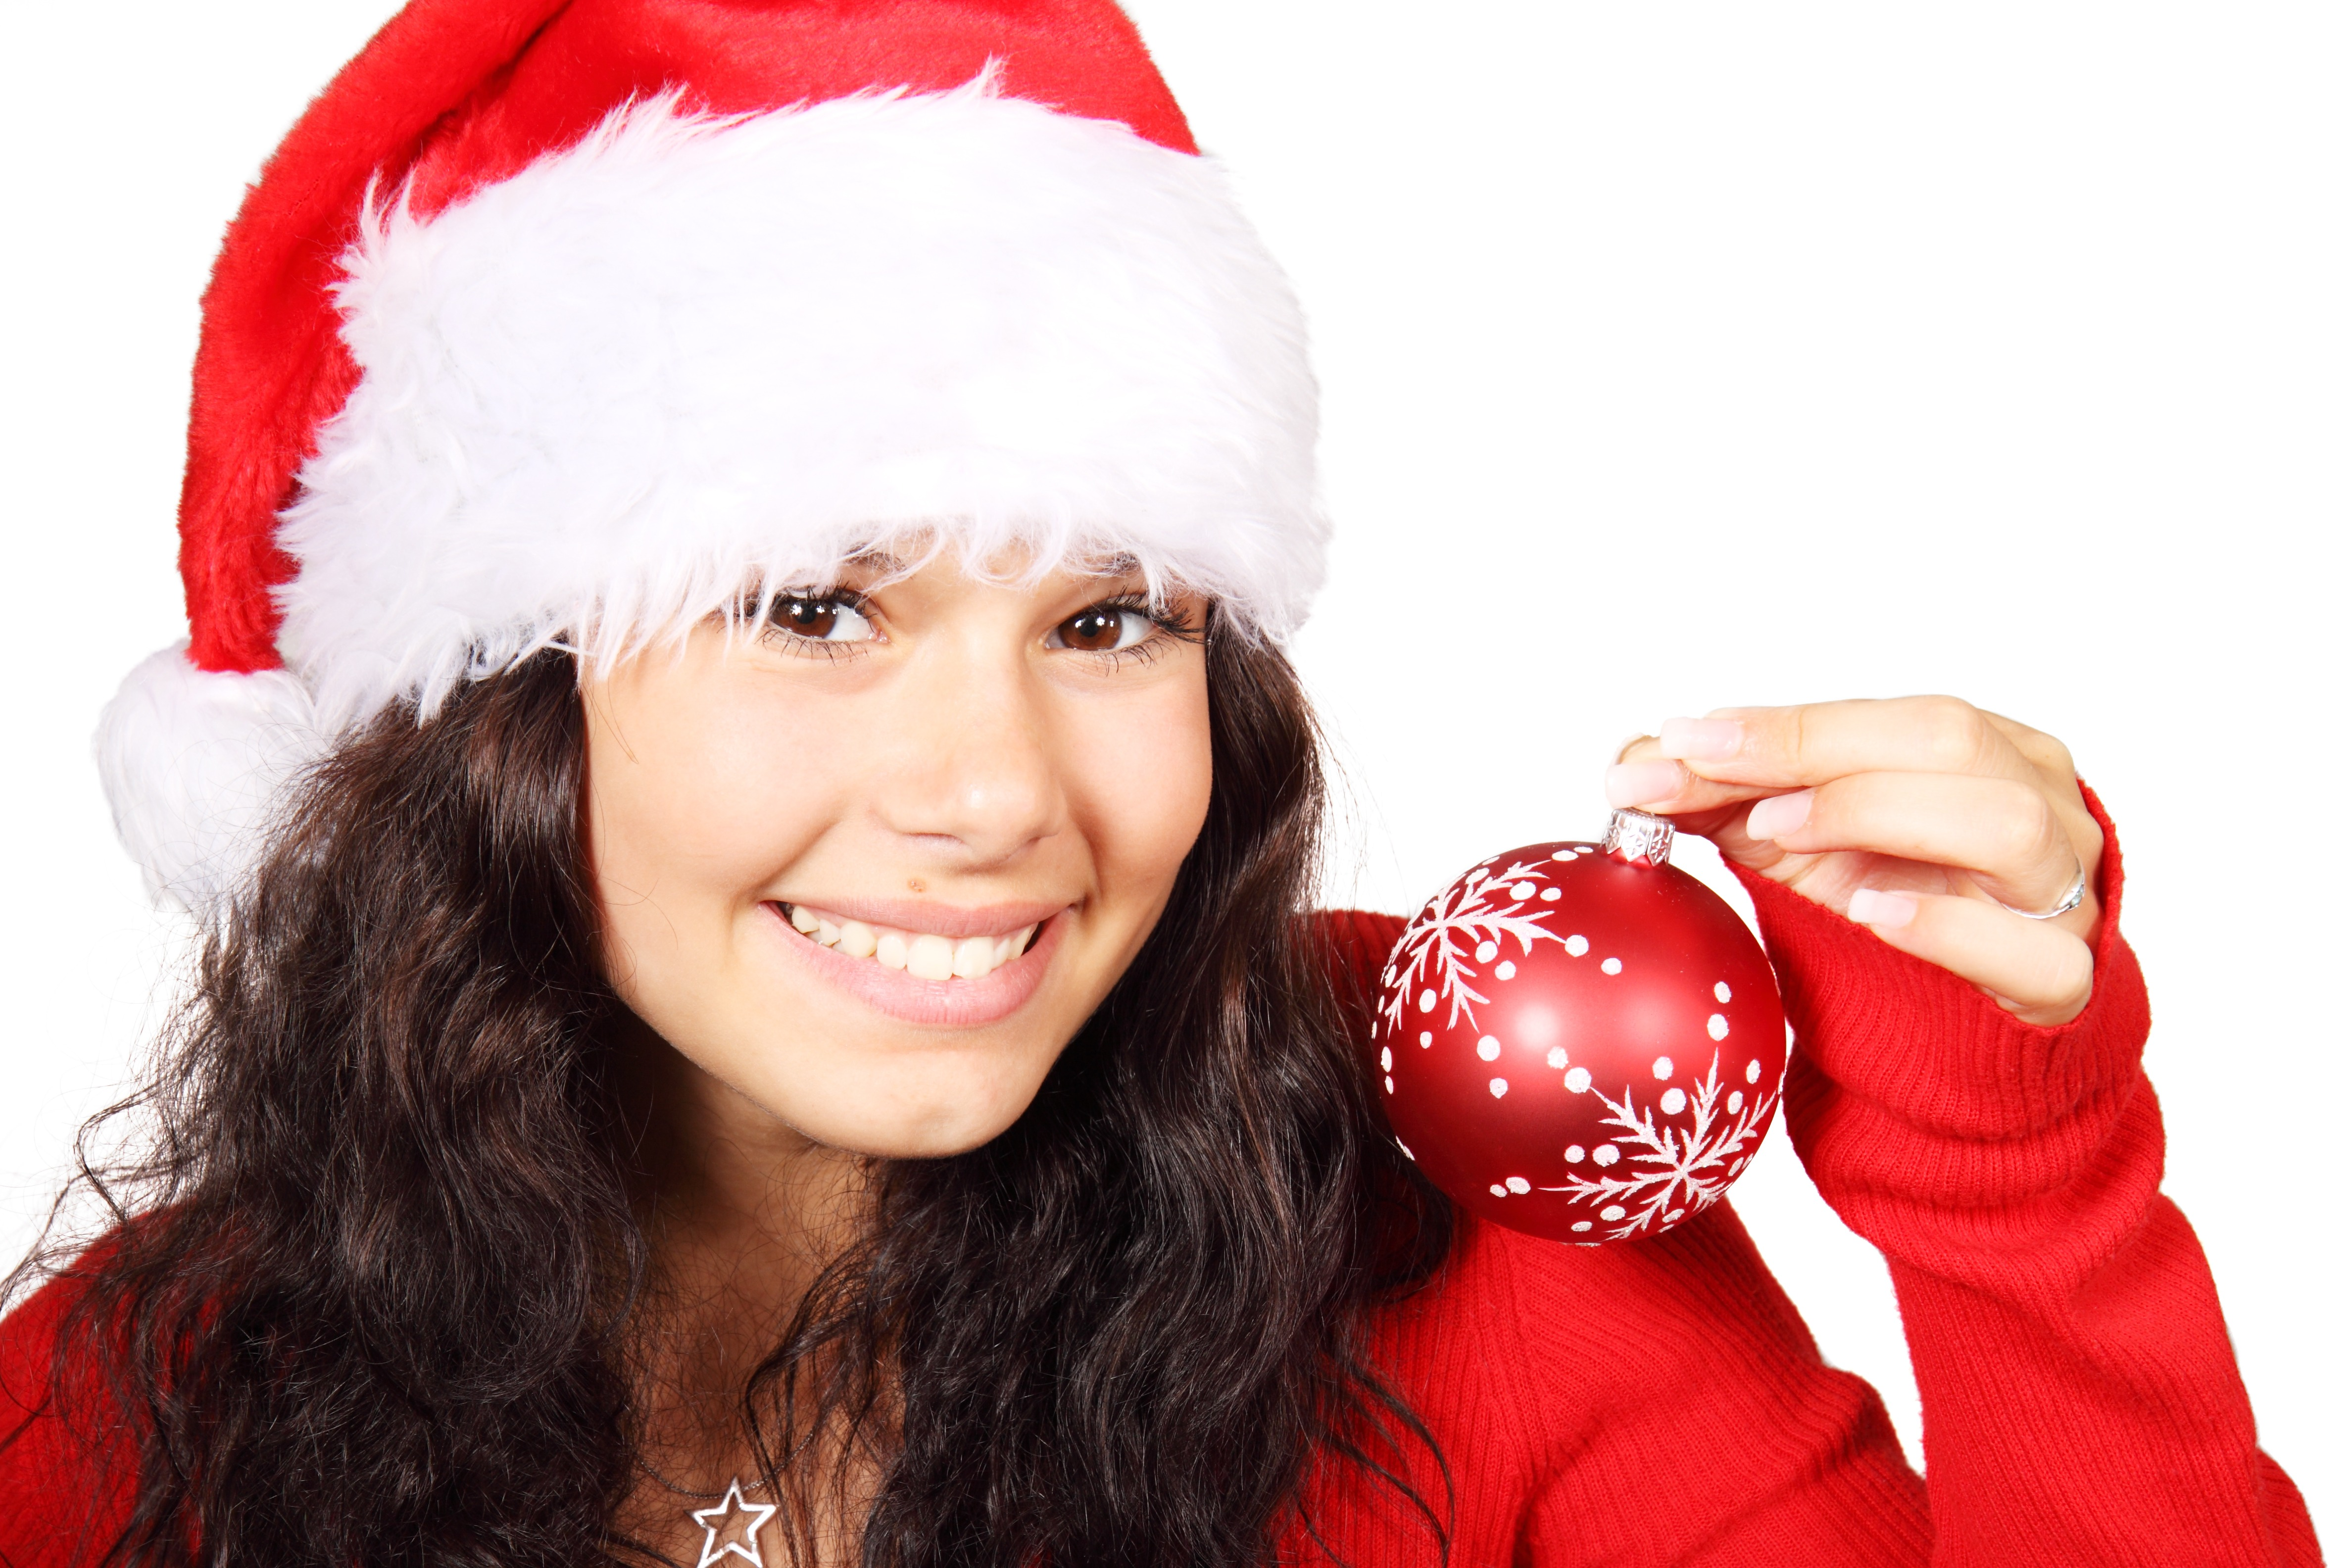 Girl on Christmas, Activity, Bauble, Celebrate, Christmas, HQ Photo